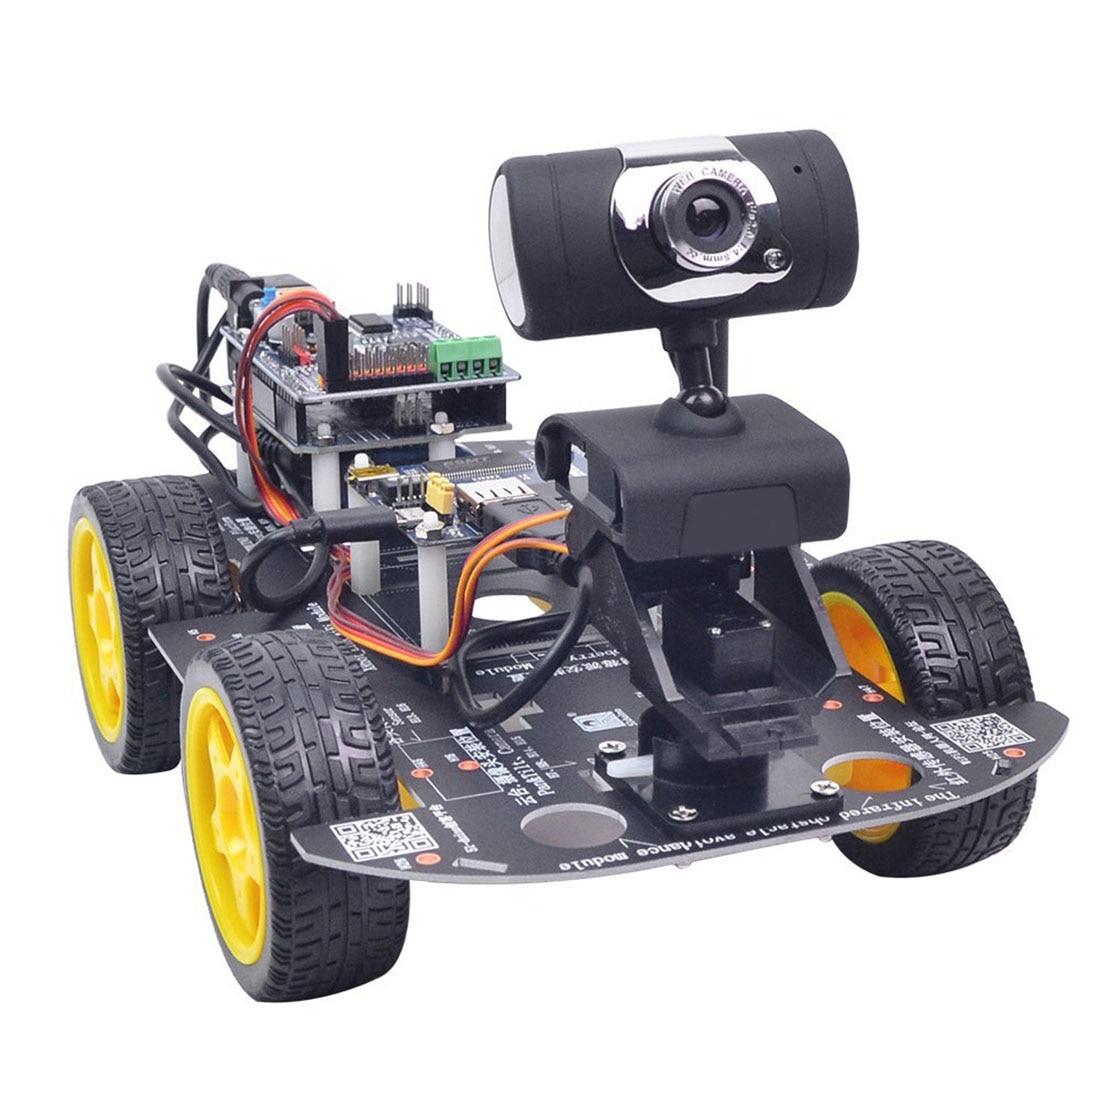 robo programavel brinquedo diy wifi vapor carro com programacao grafica xr bloco linux para arduino uno